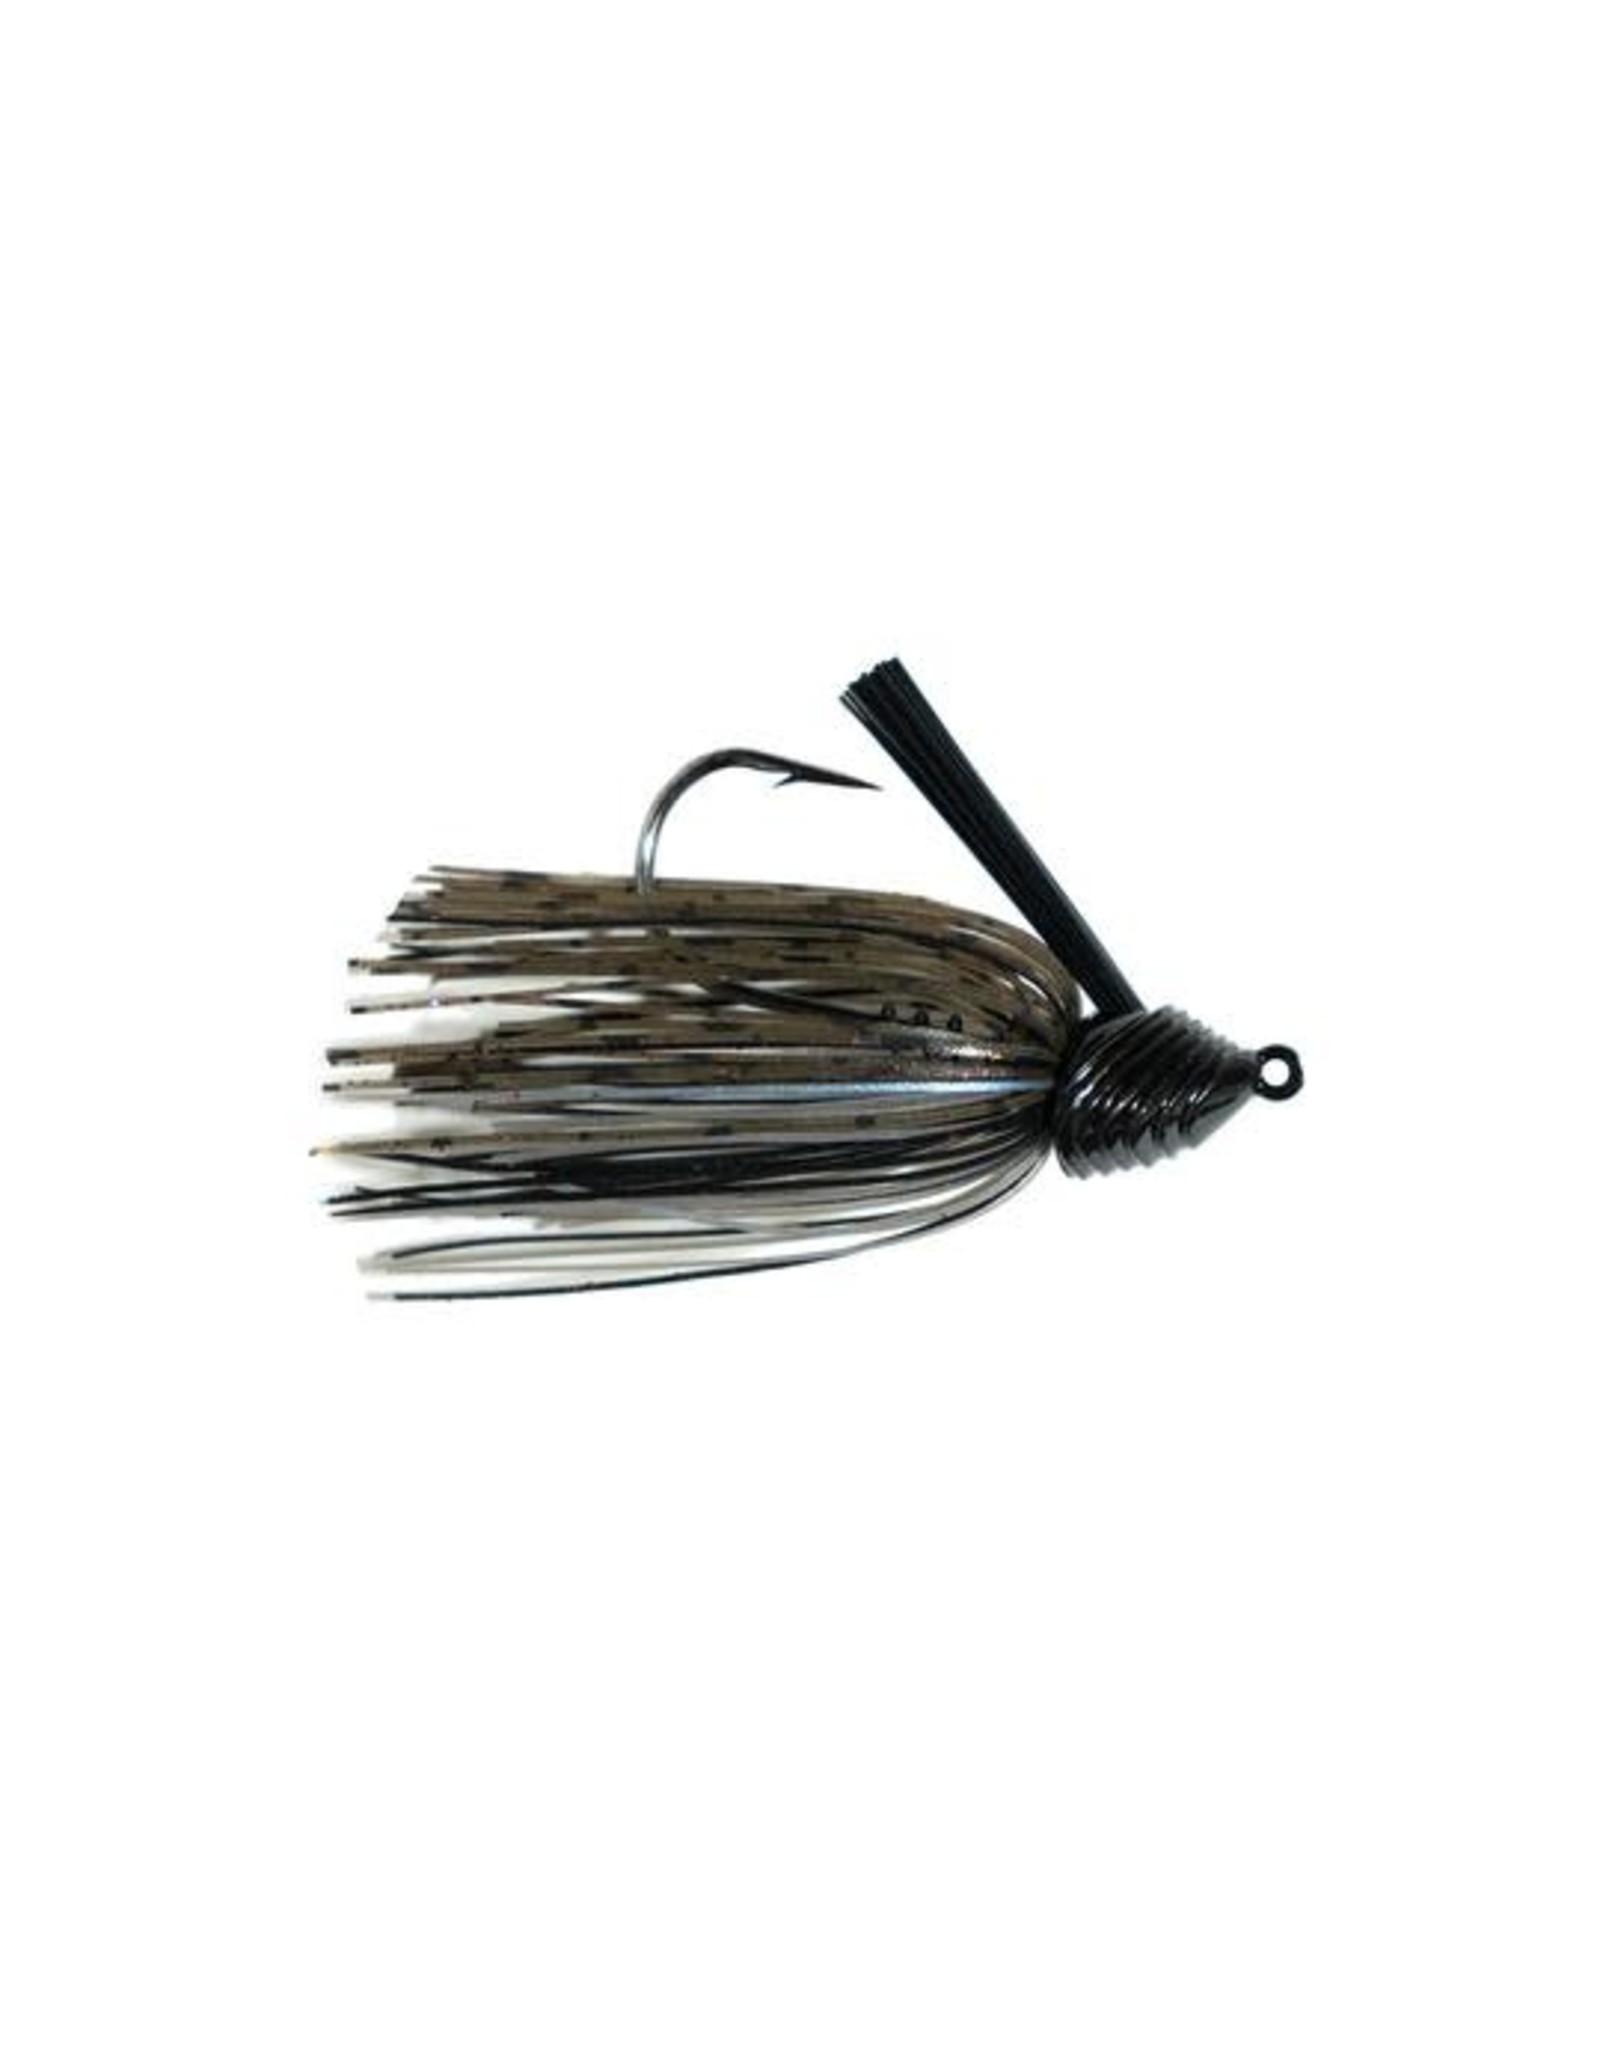 6th Sense Fishing 6th Sense Divine Scrape Grass Jig